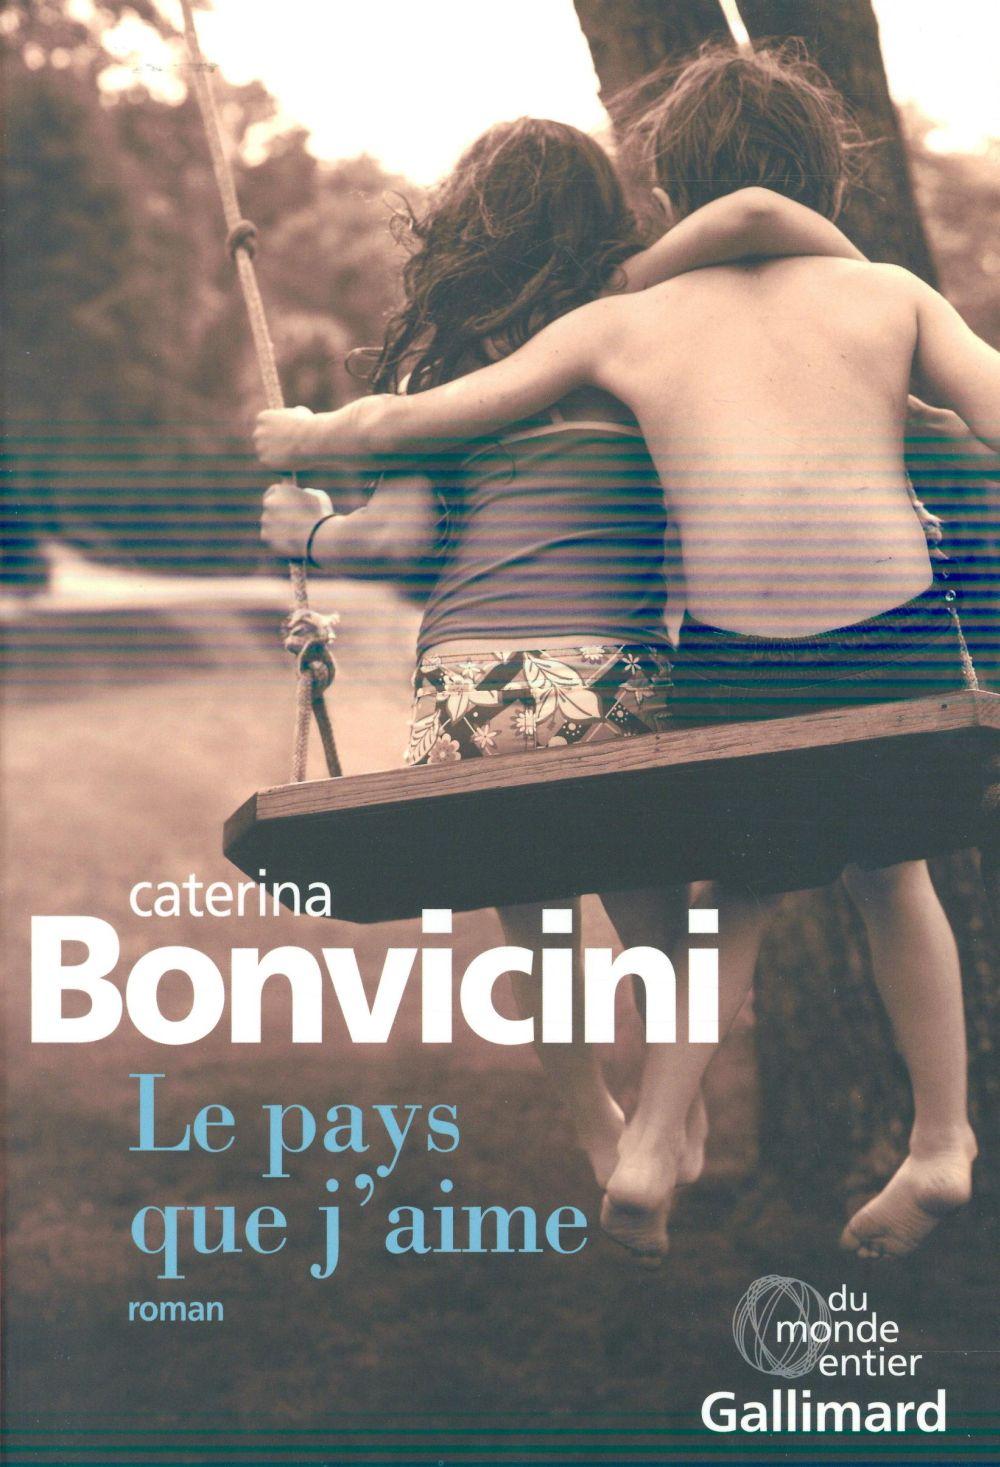 Bonvicini Caterina - LE PAYS QUE J'AIME